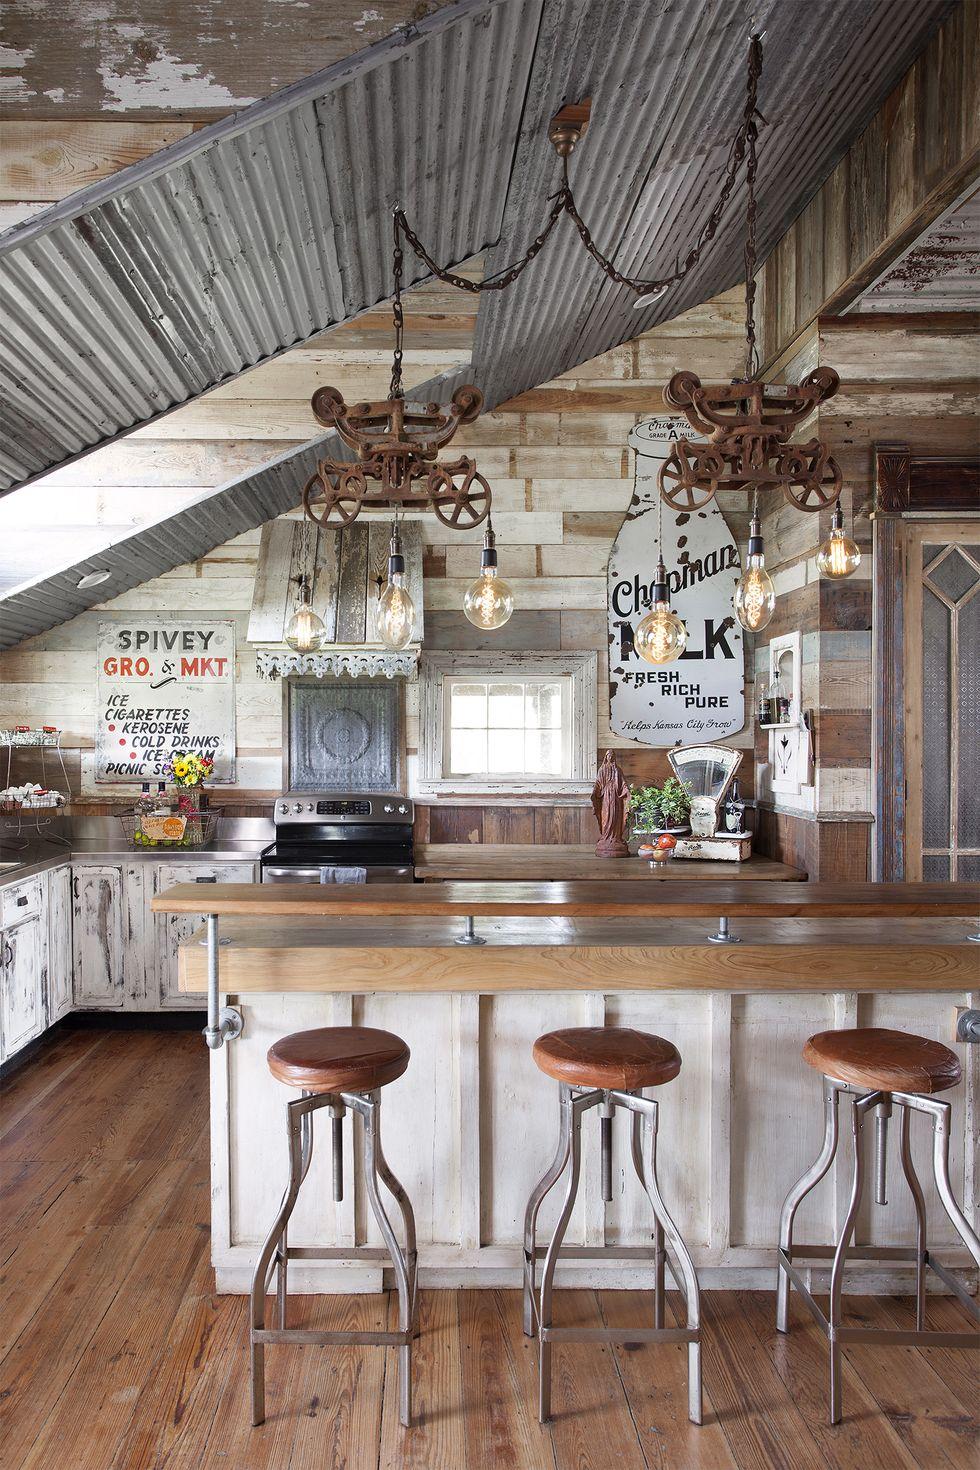 Rustic Farmhouse Kitchen Ideas To Adapt